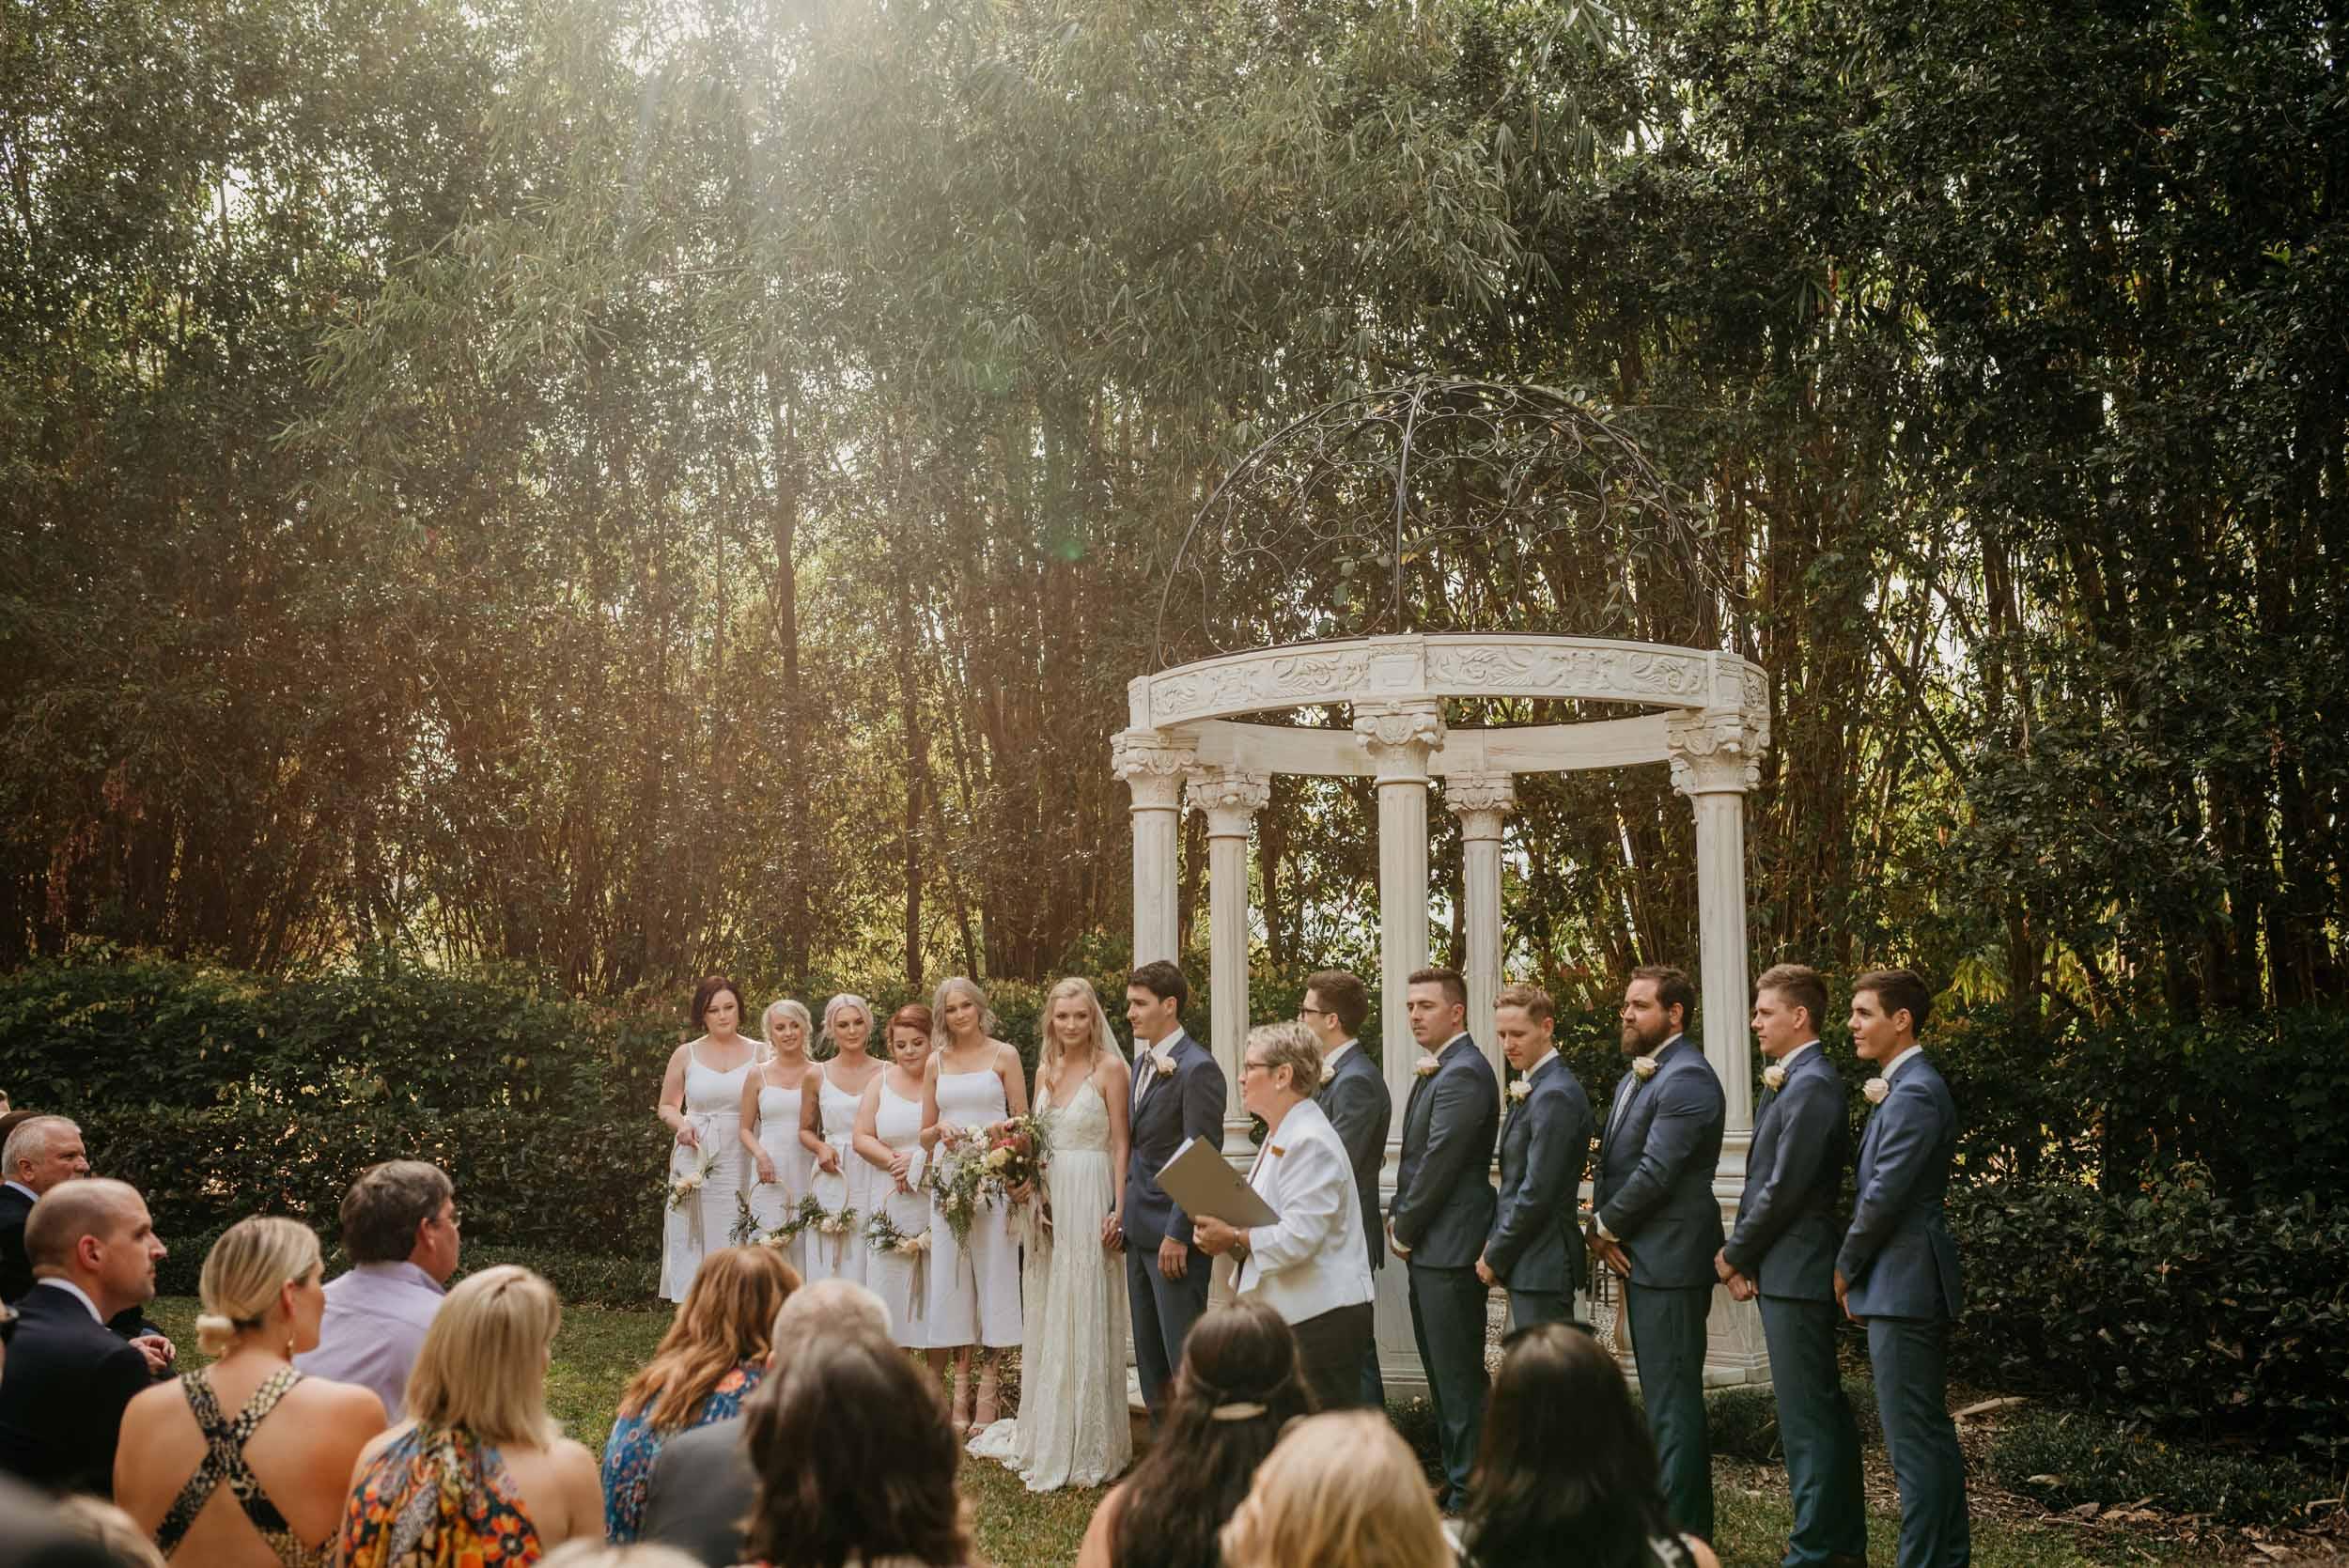 The Raw Photographer - Cairns Wedding Photographer - Laloli - Cairns Garden Wedding - Wedding Dress-34.jpg